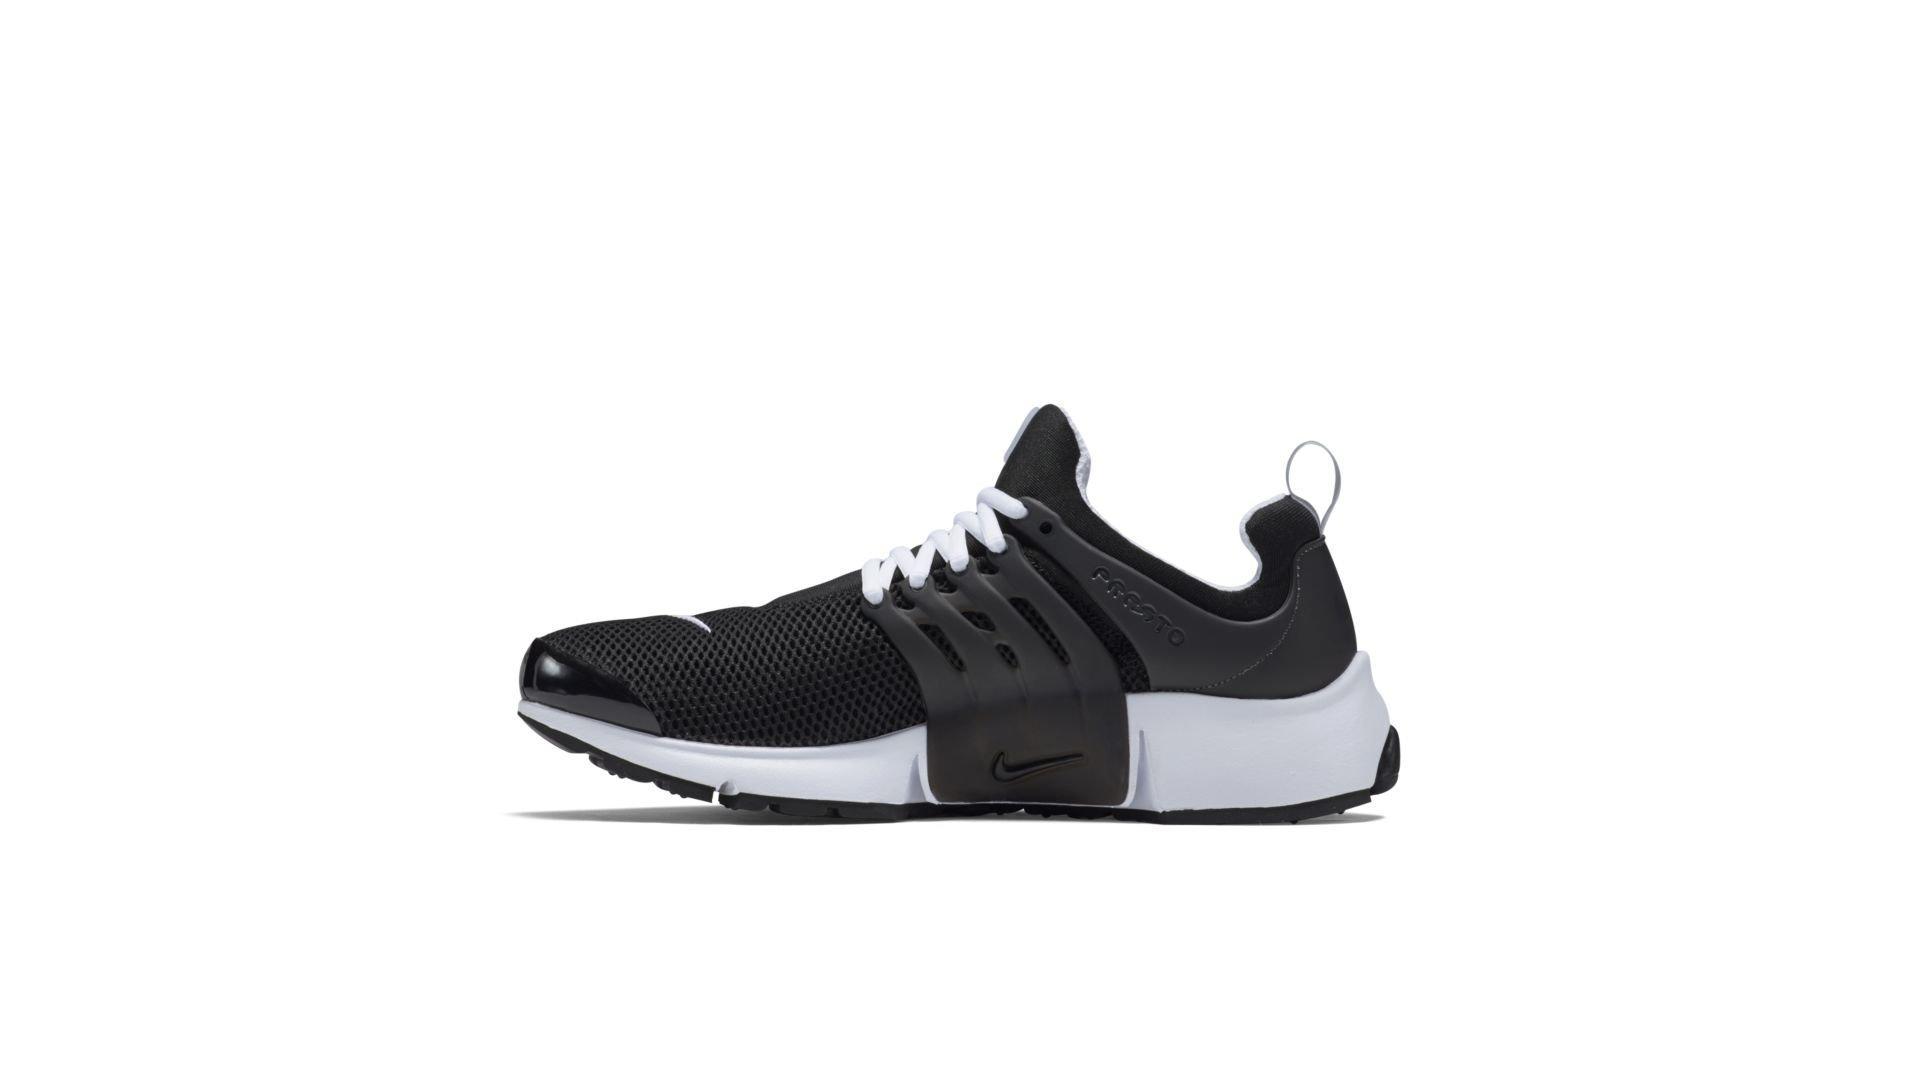 Nike Air Presto Black White (789869-001)